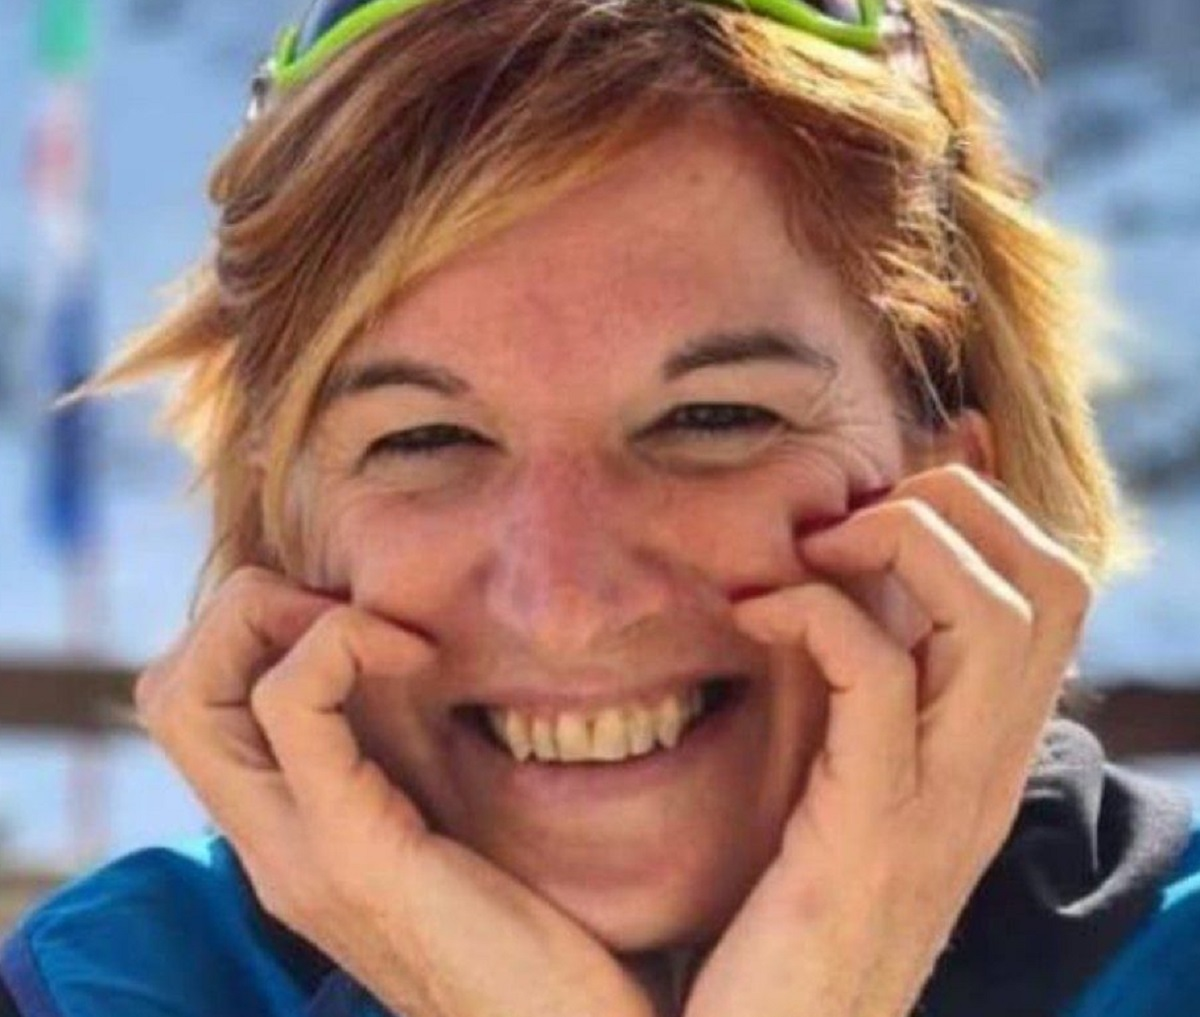 Laura Ziliani omicidio morte soffocamento cuscino